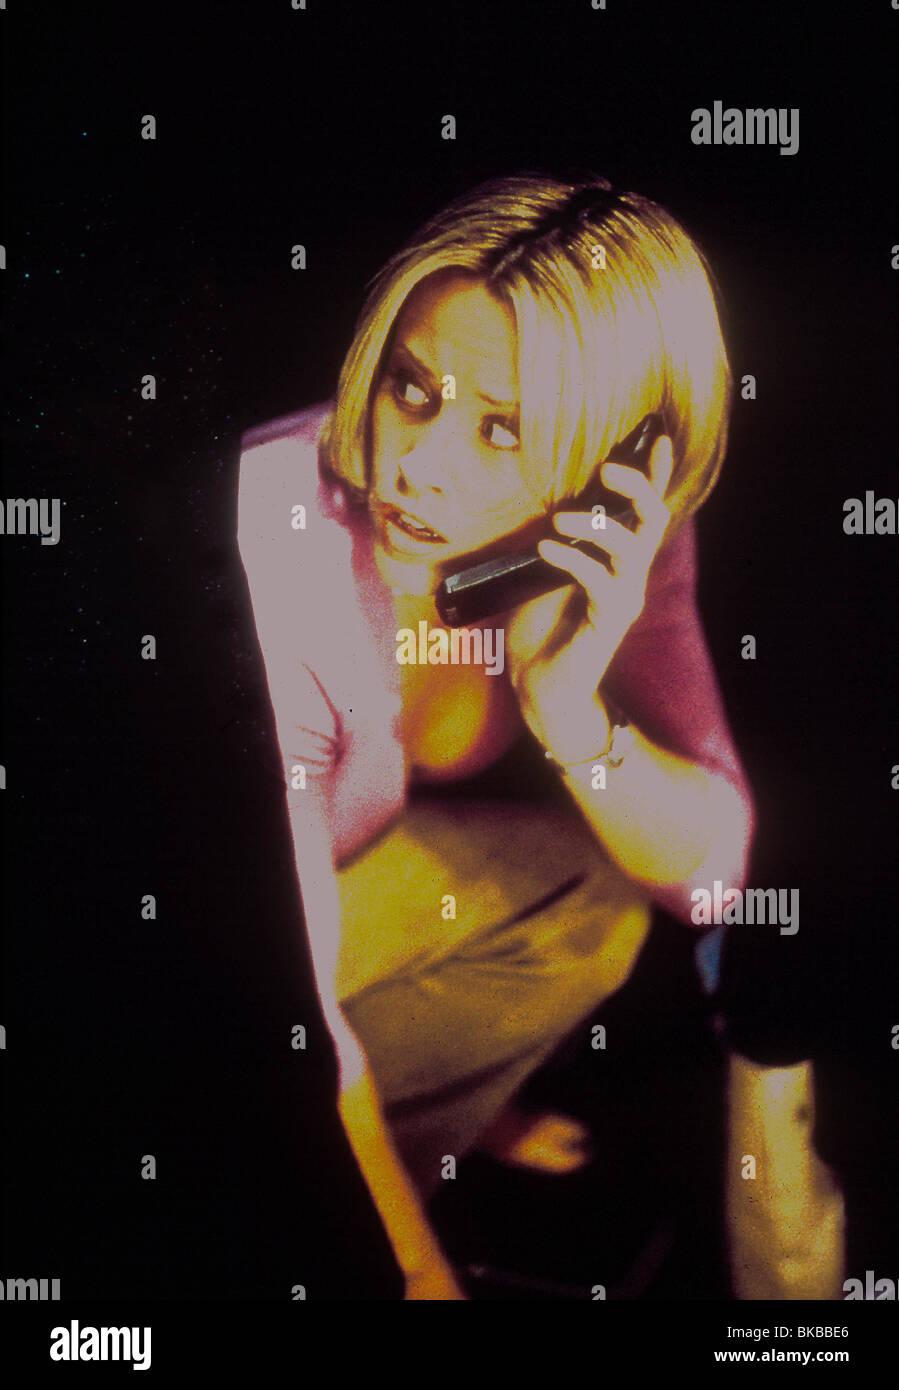 SCREAM 3 -2000 JENNY MCCARTHY - Stock Image